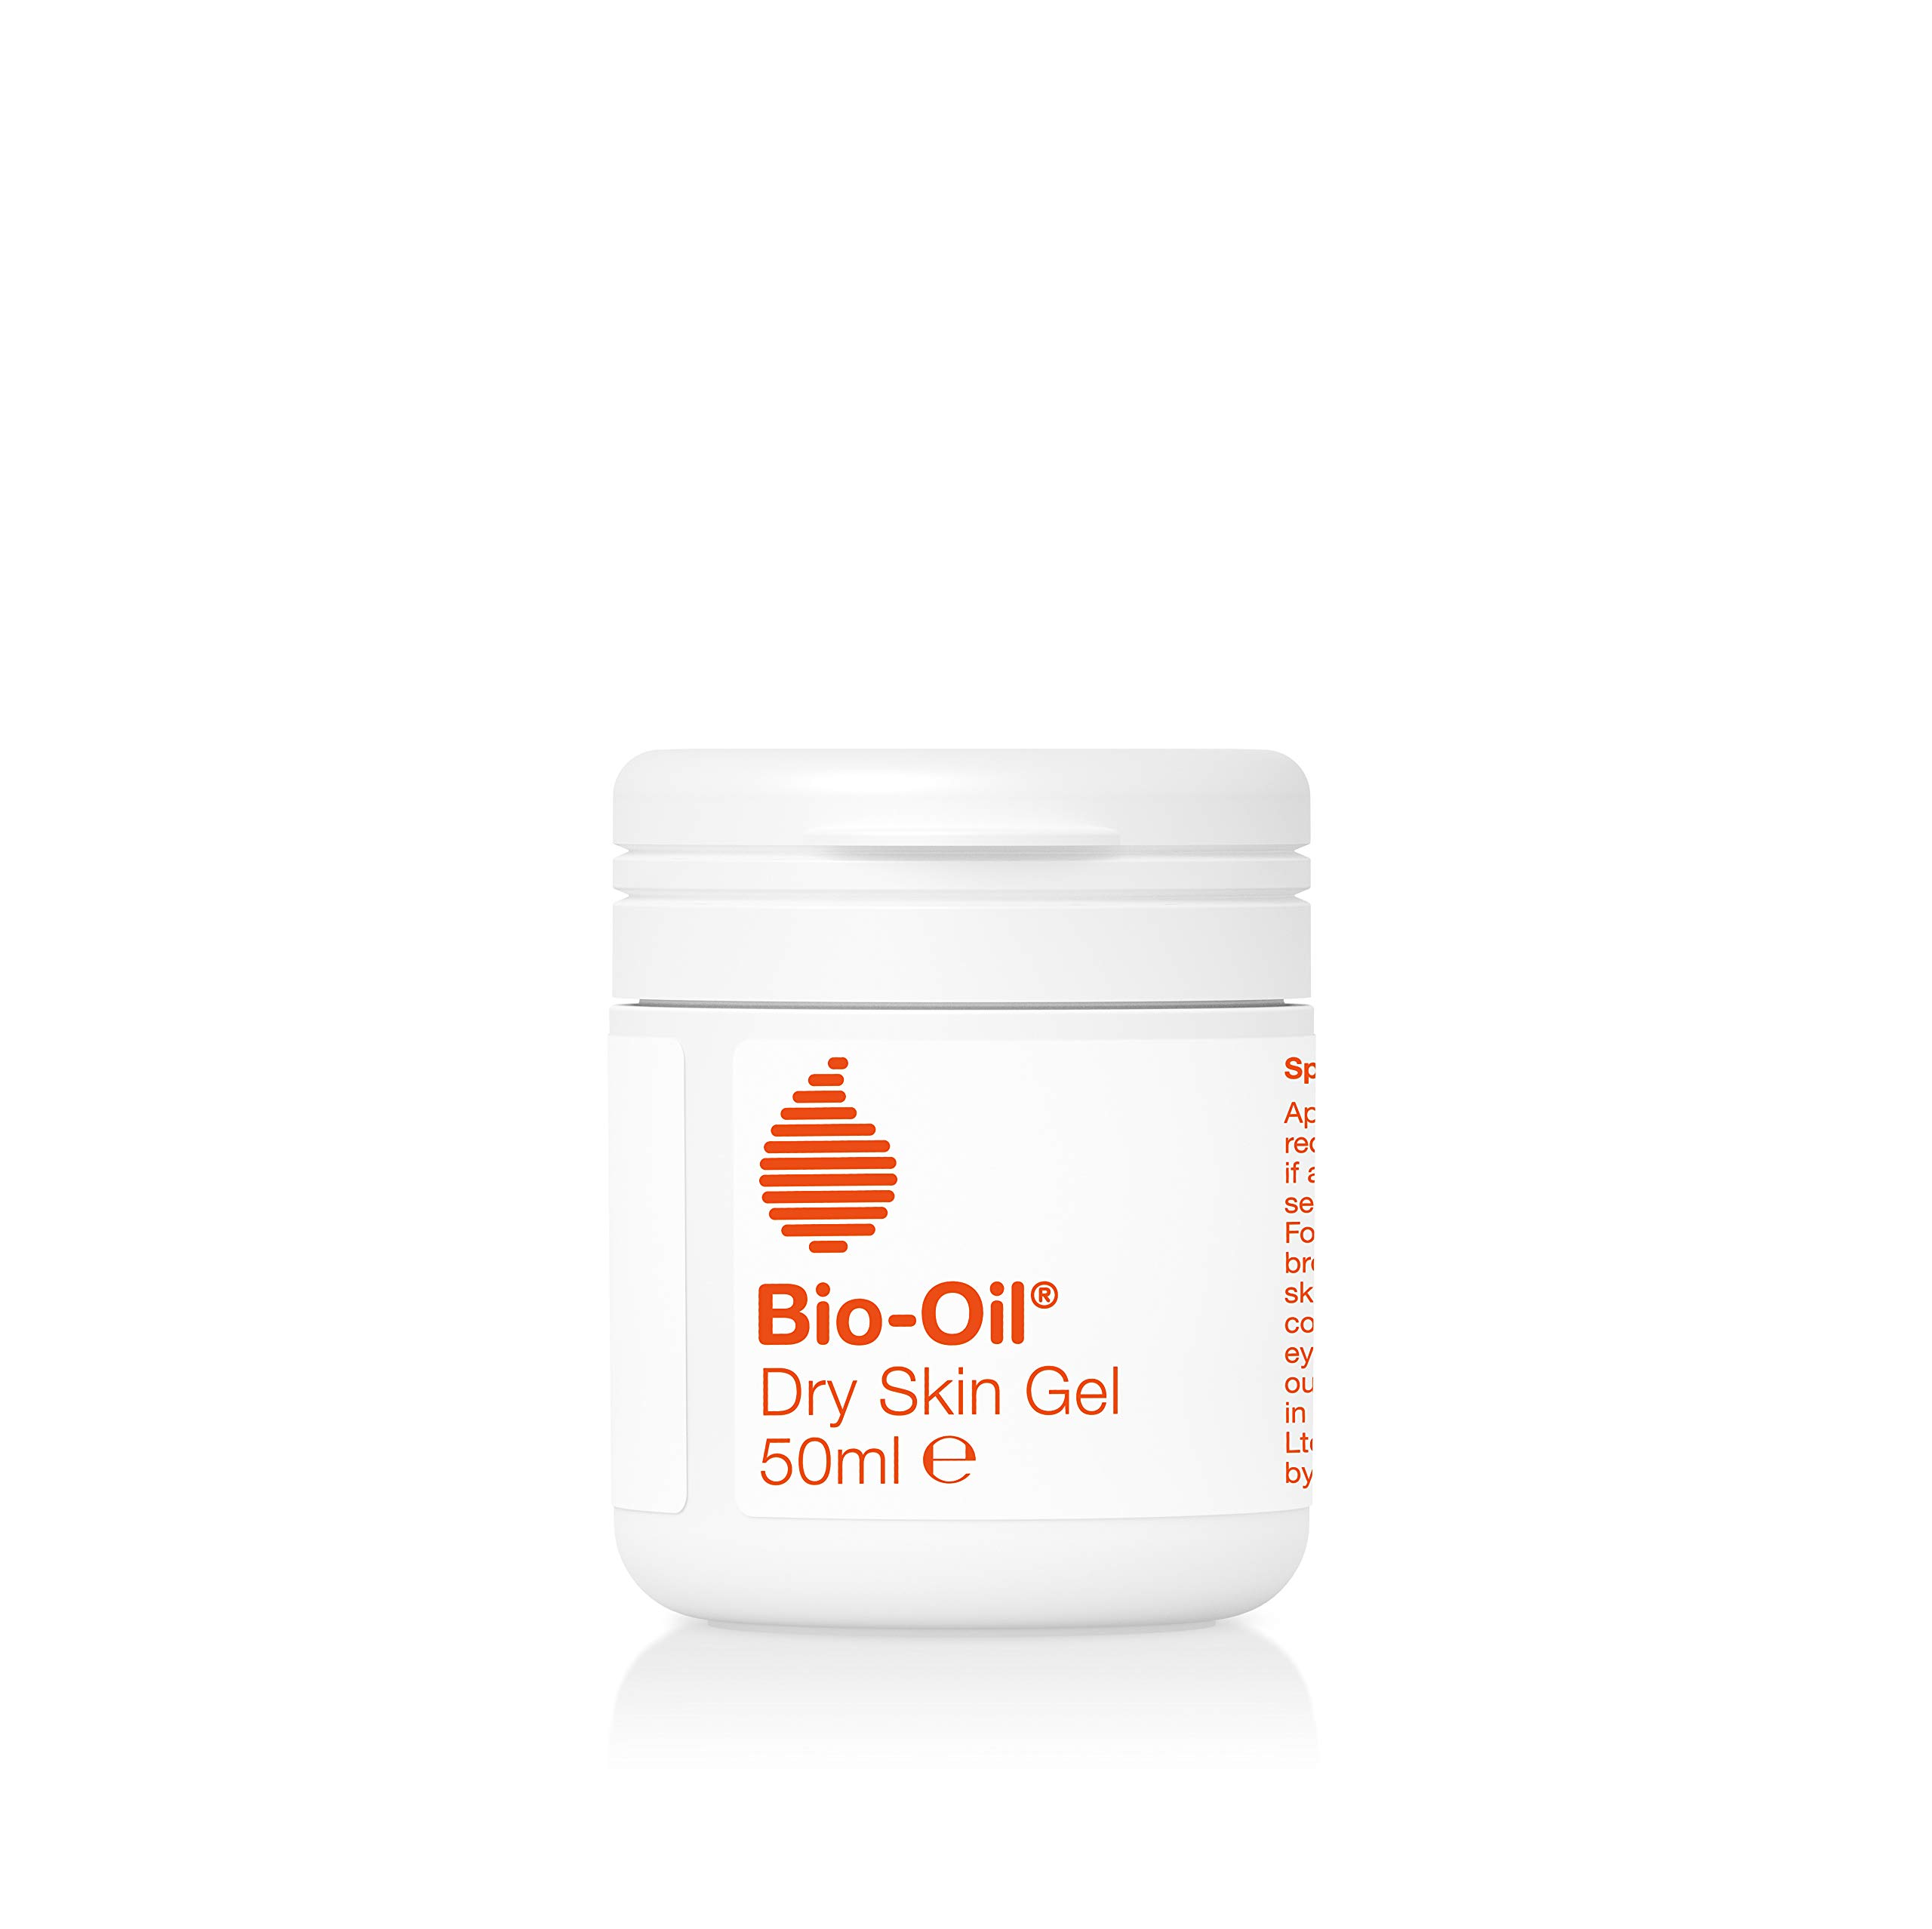 Bio-Oil Dry Skin Gel, 50 ml